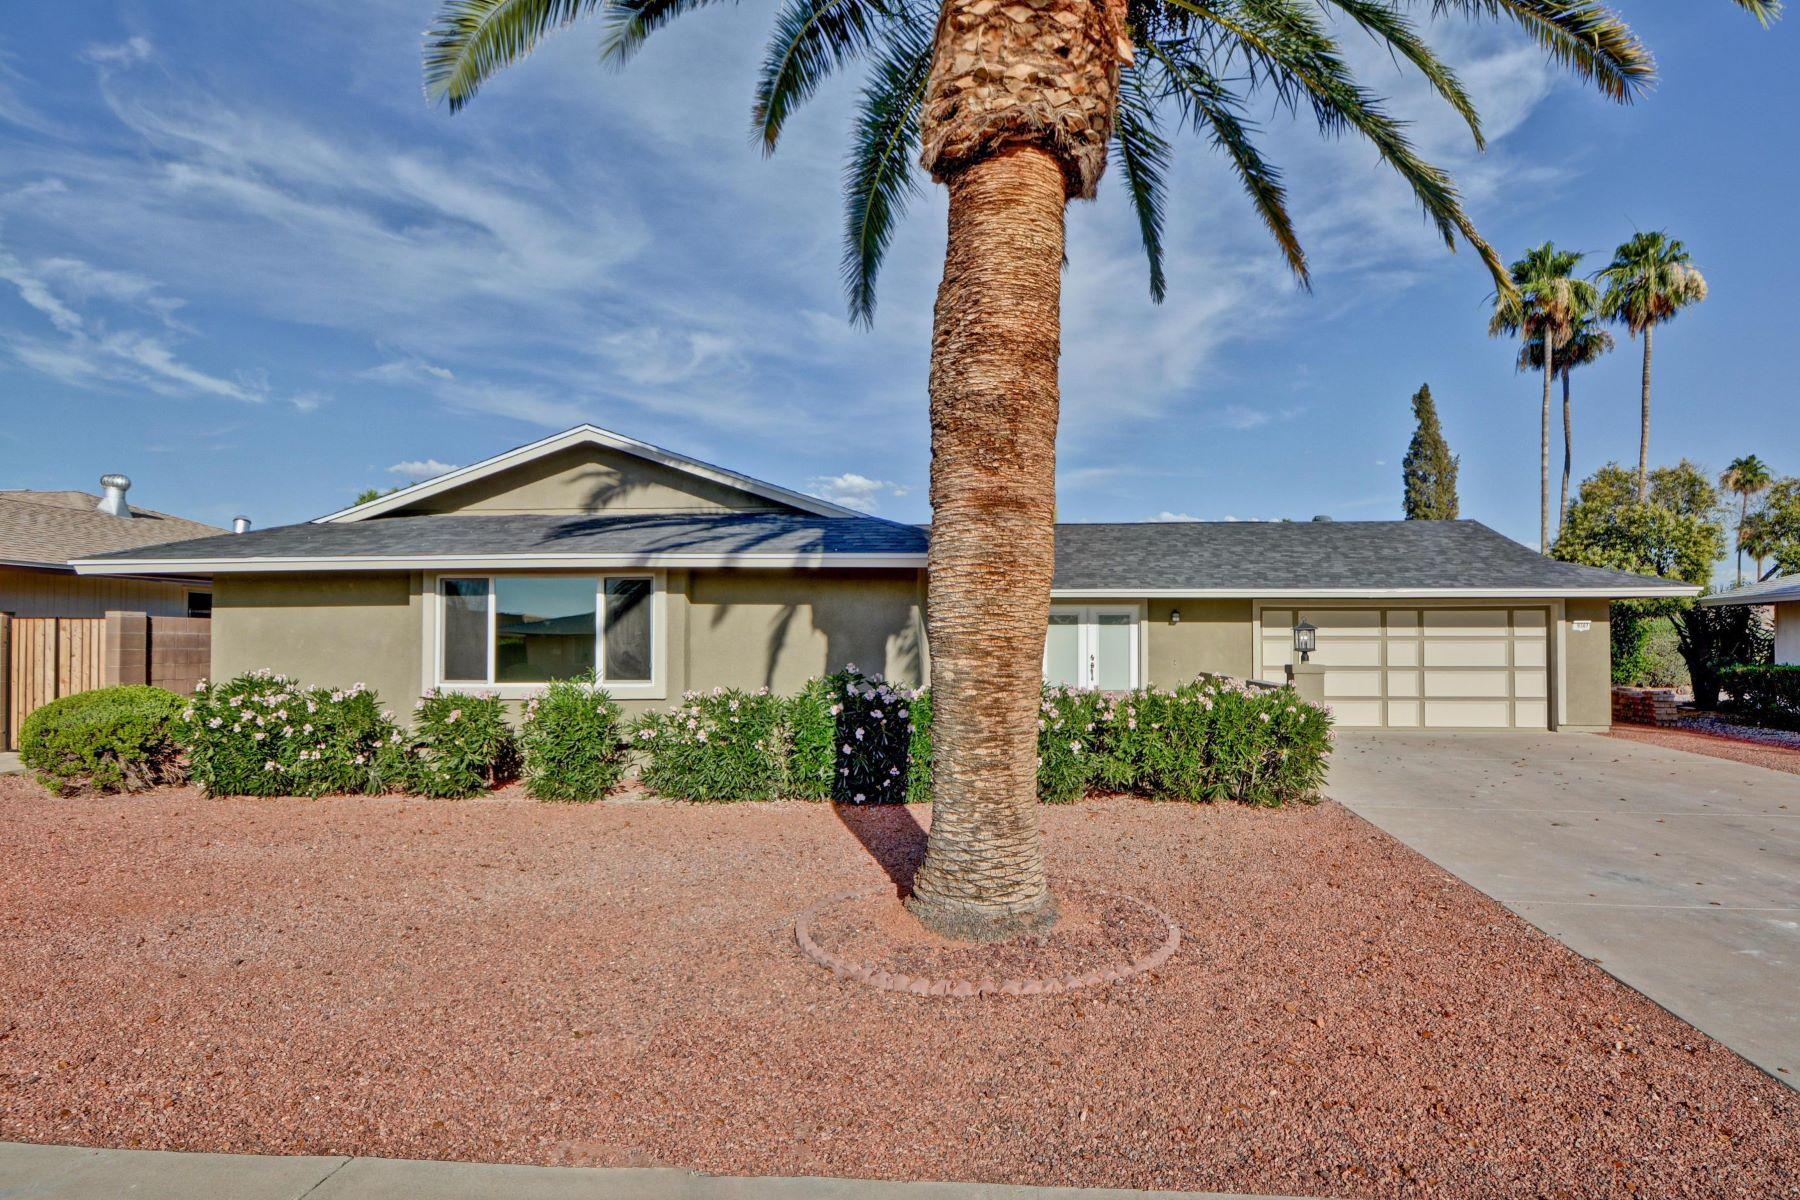 single family homes for Active at Sun City 9307 W GLEN OAKS CIR Sun City, Arizona 85351 United States